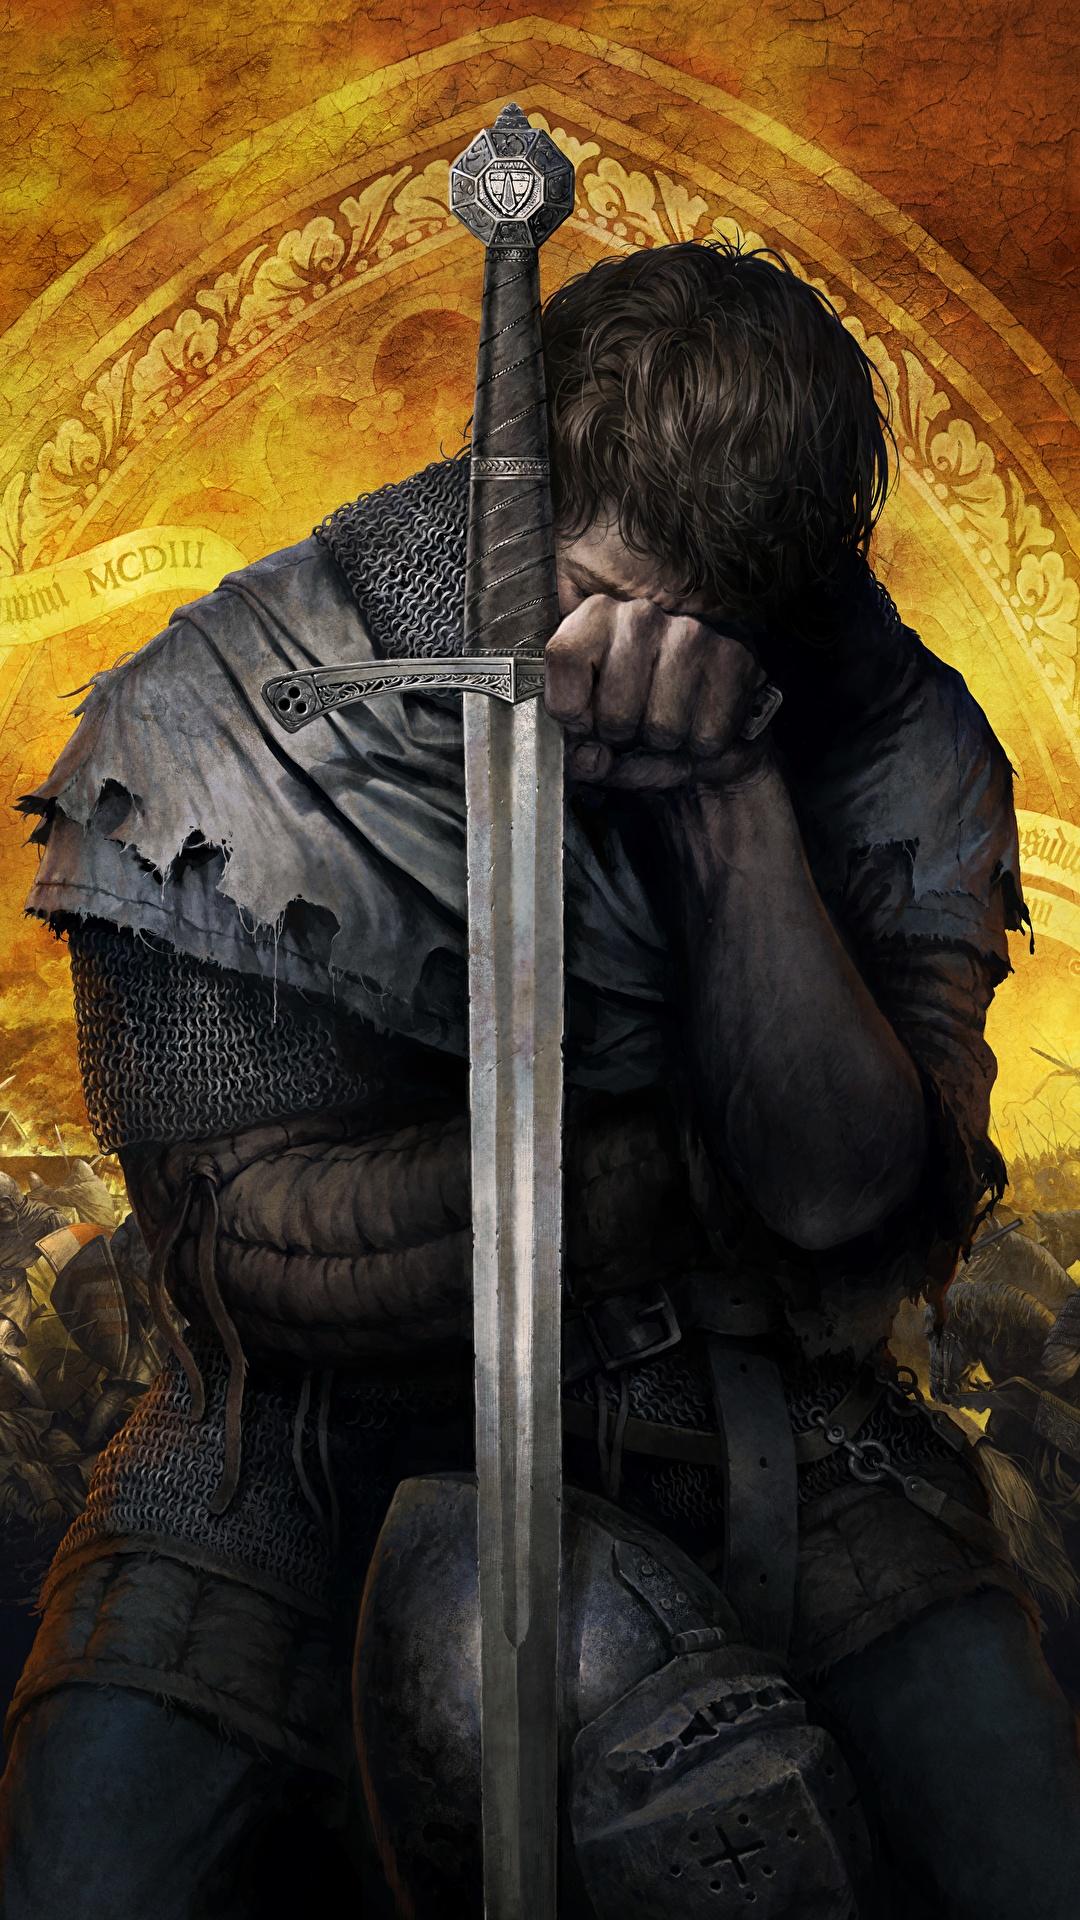 Photo Kingdom Come Deliverance Armor Swords Warriors 1080x1920 1080x1920